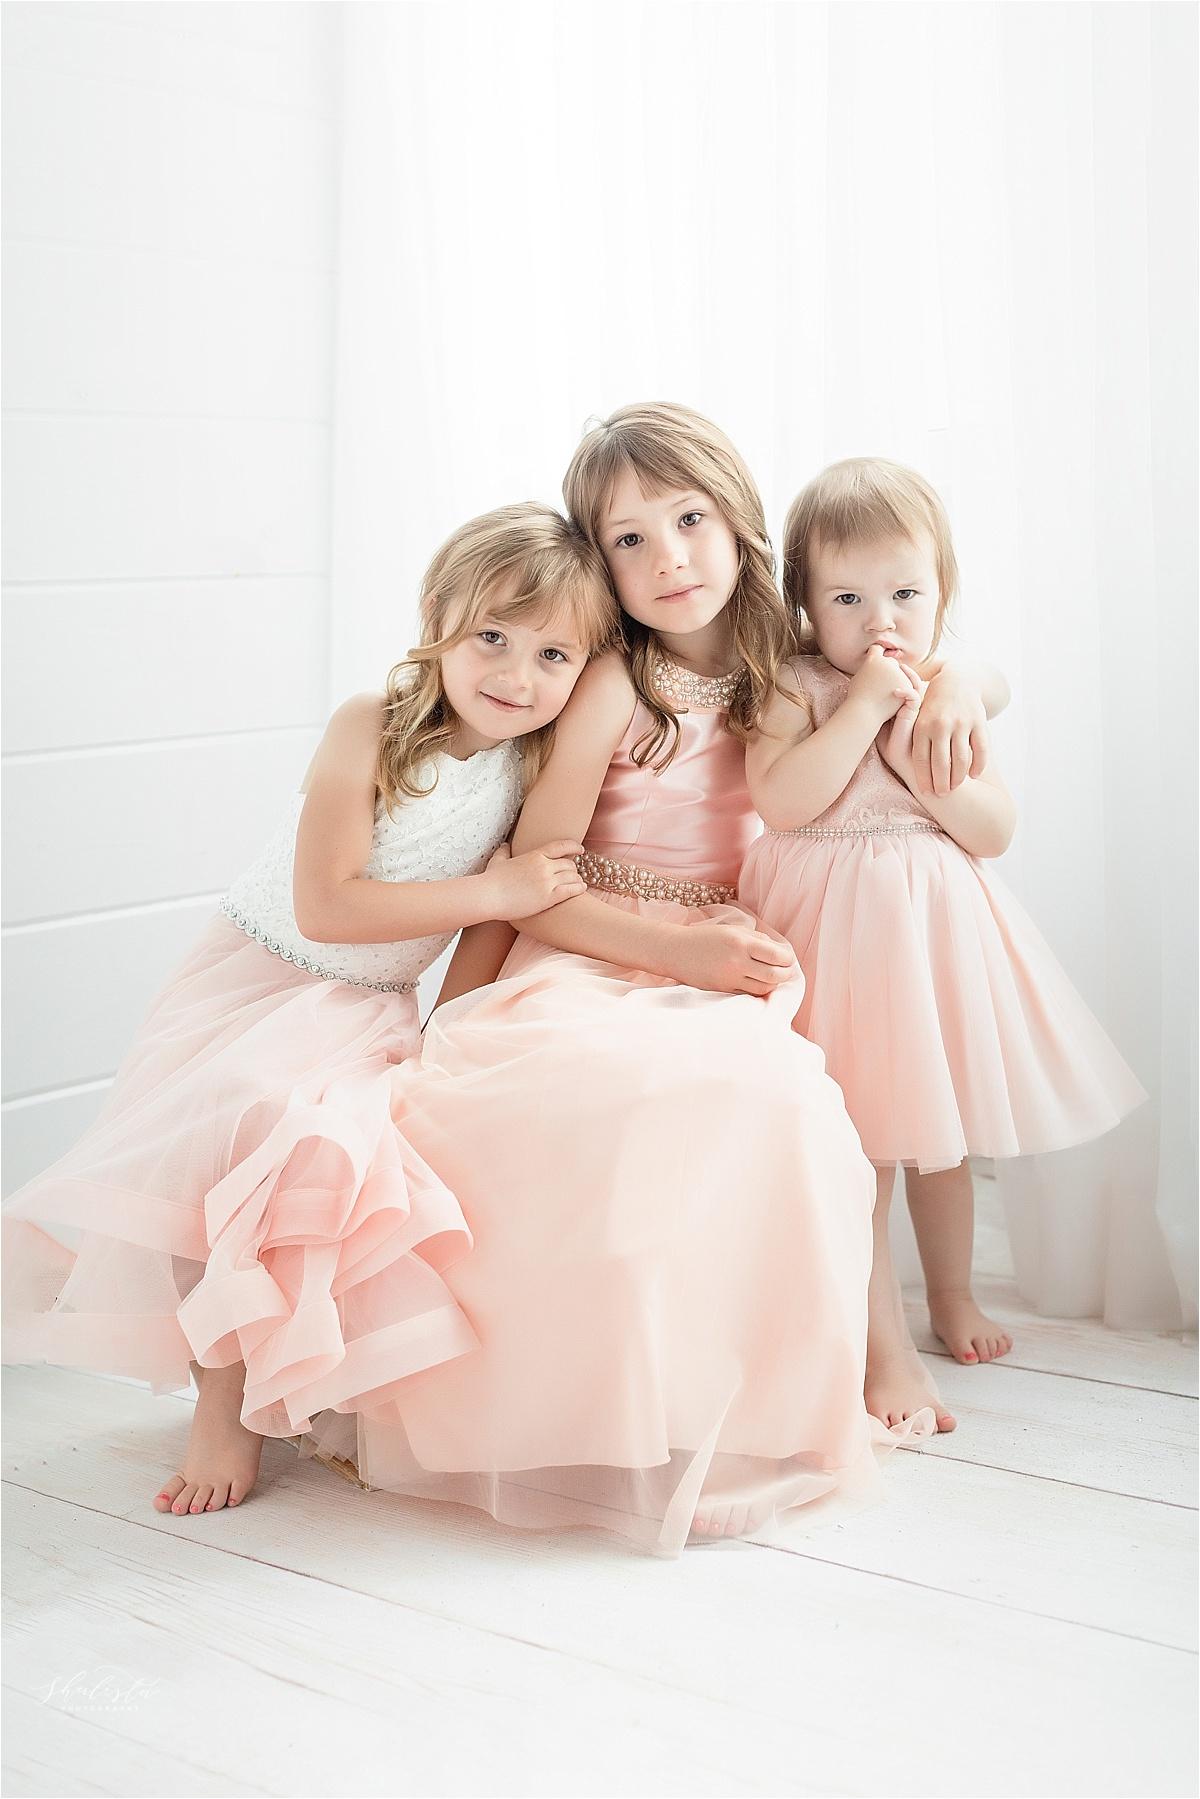 Shalista_Family_Portraits_Sioux_Falls020.jpg